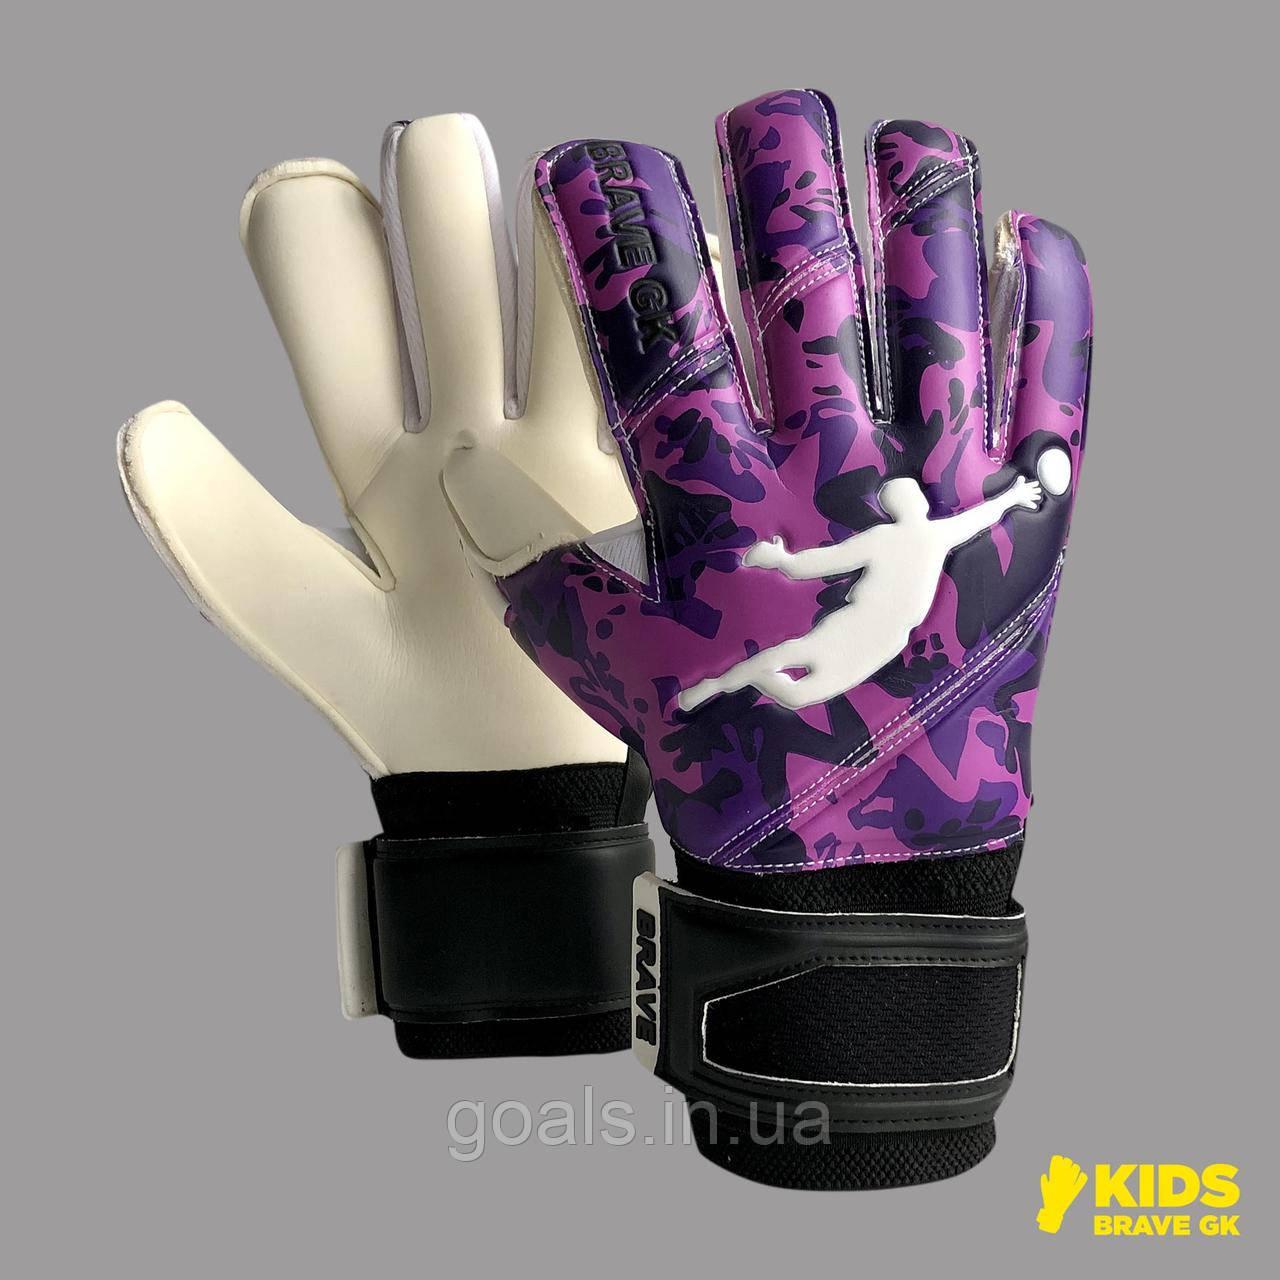 Перчатки вратарские BRAVE GK REFLEX CAMO PURPLE